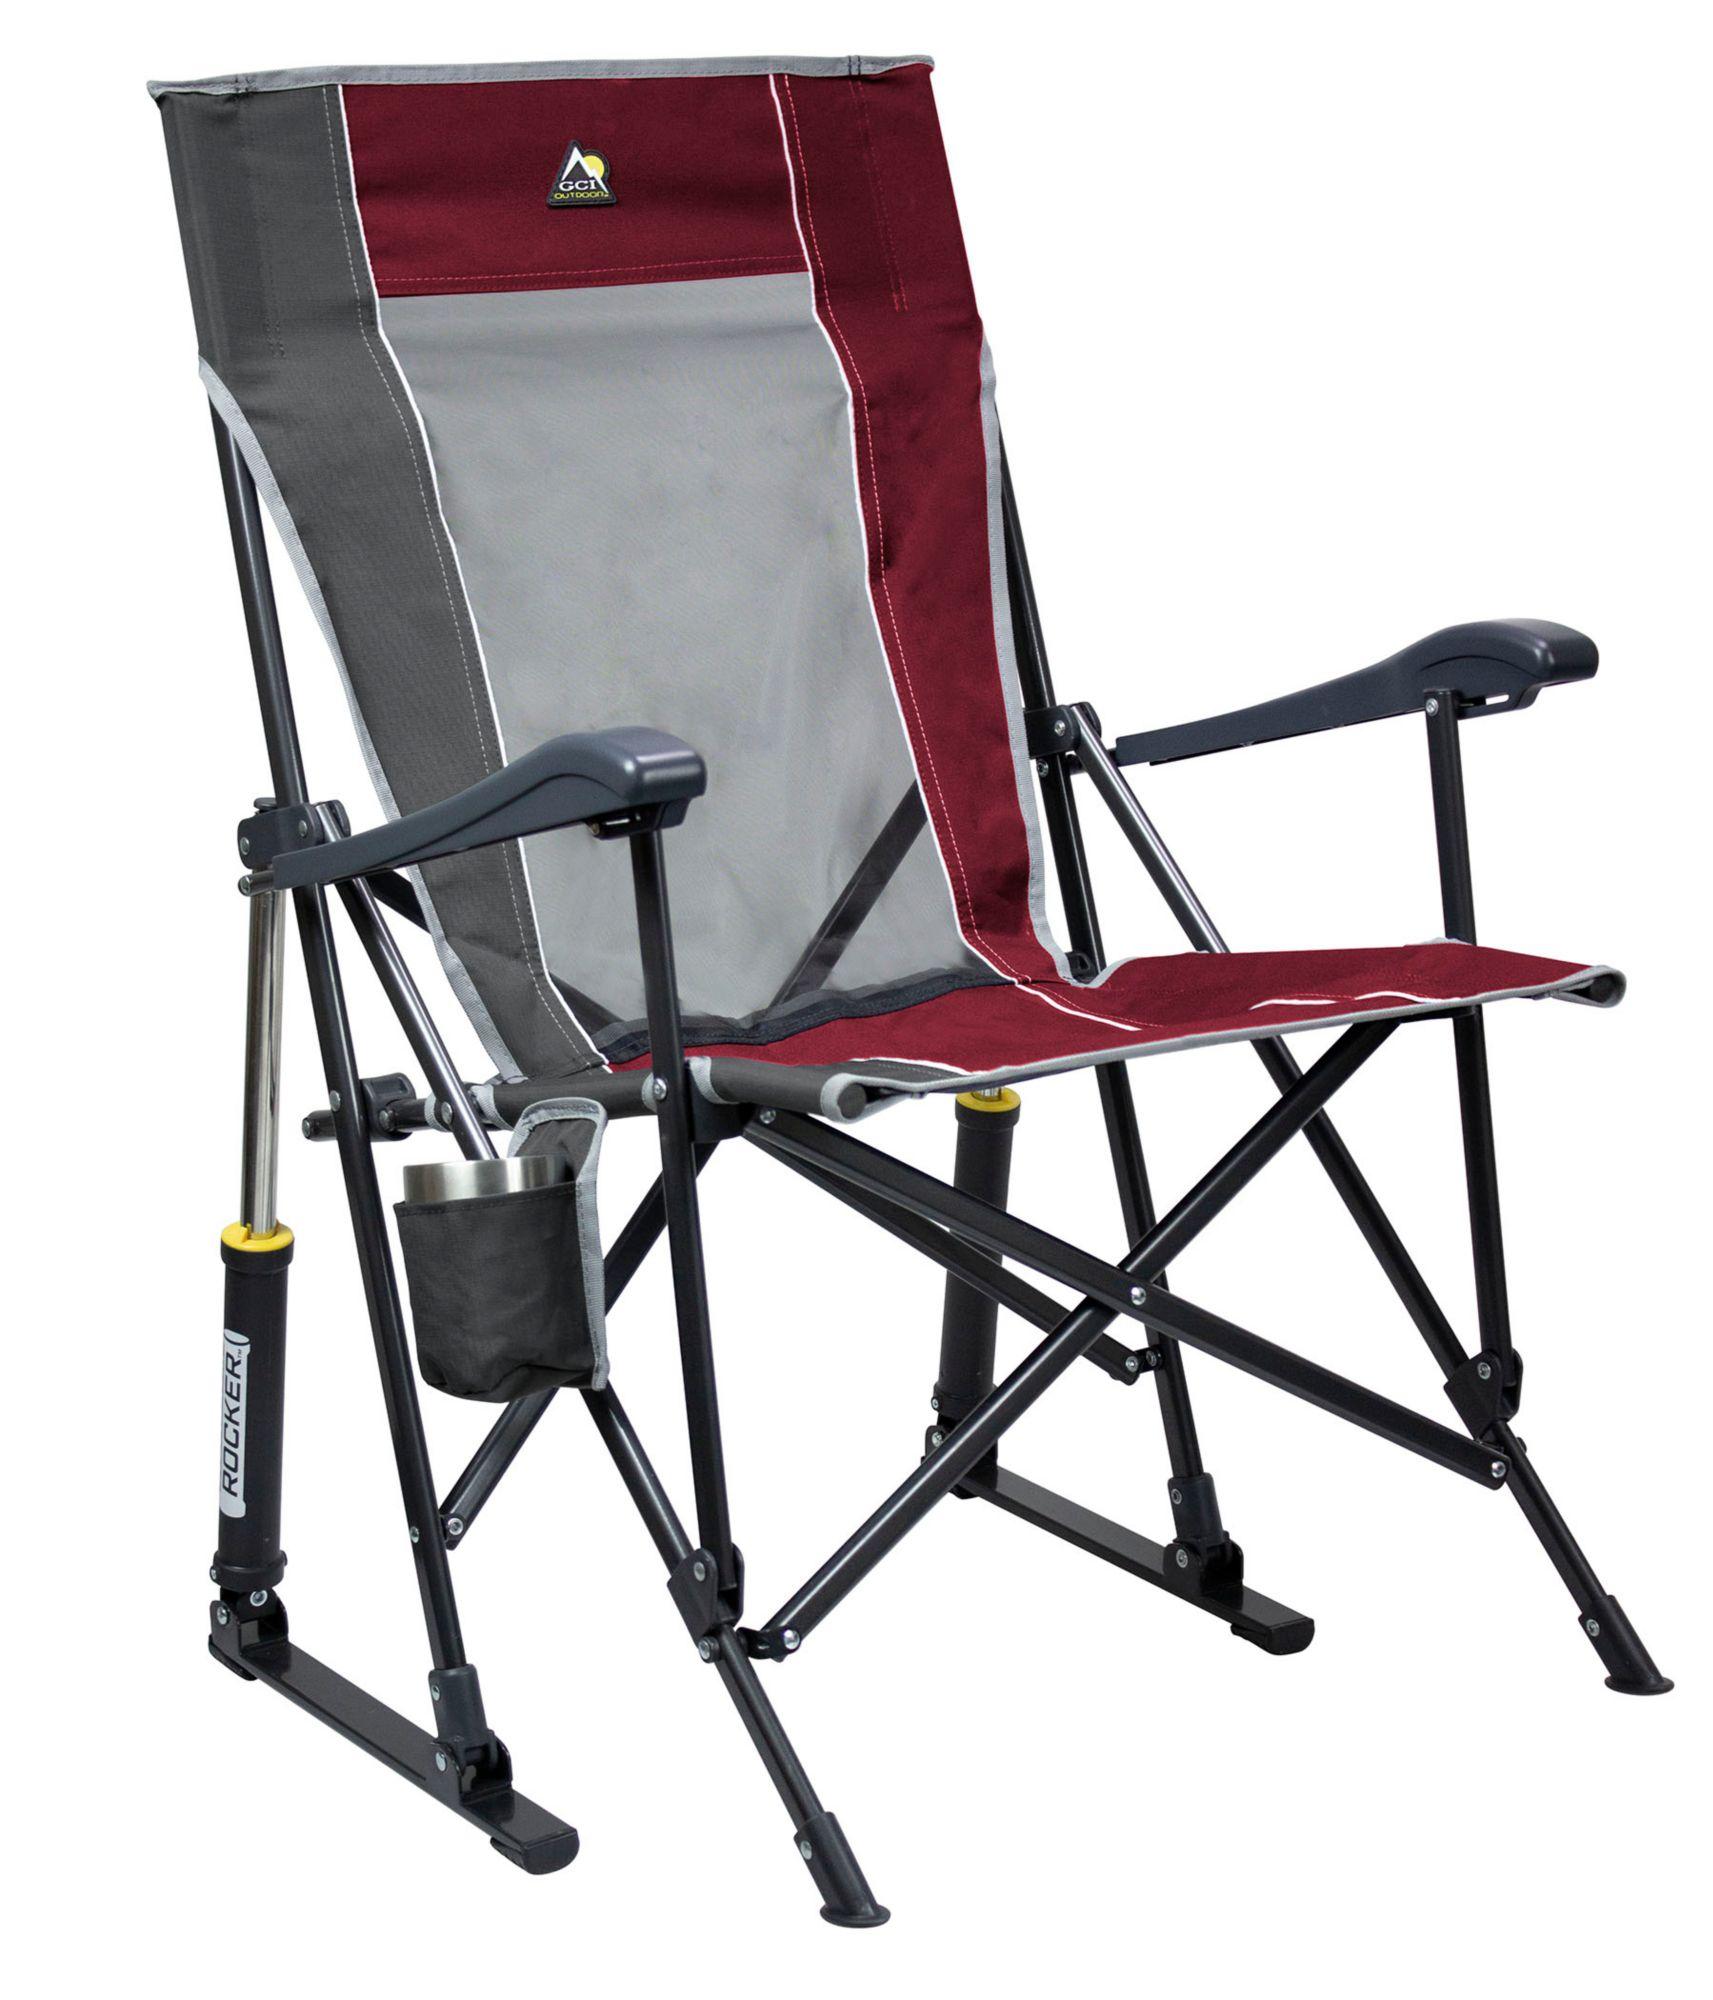 gci outdoor chair